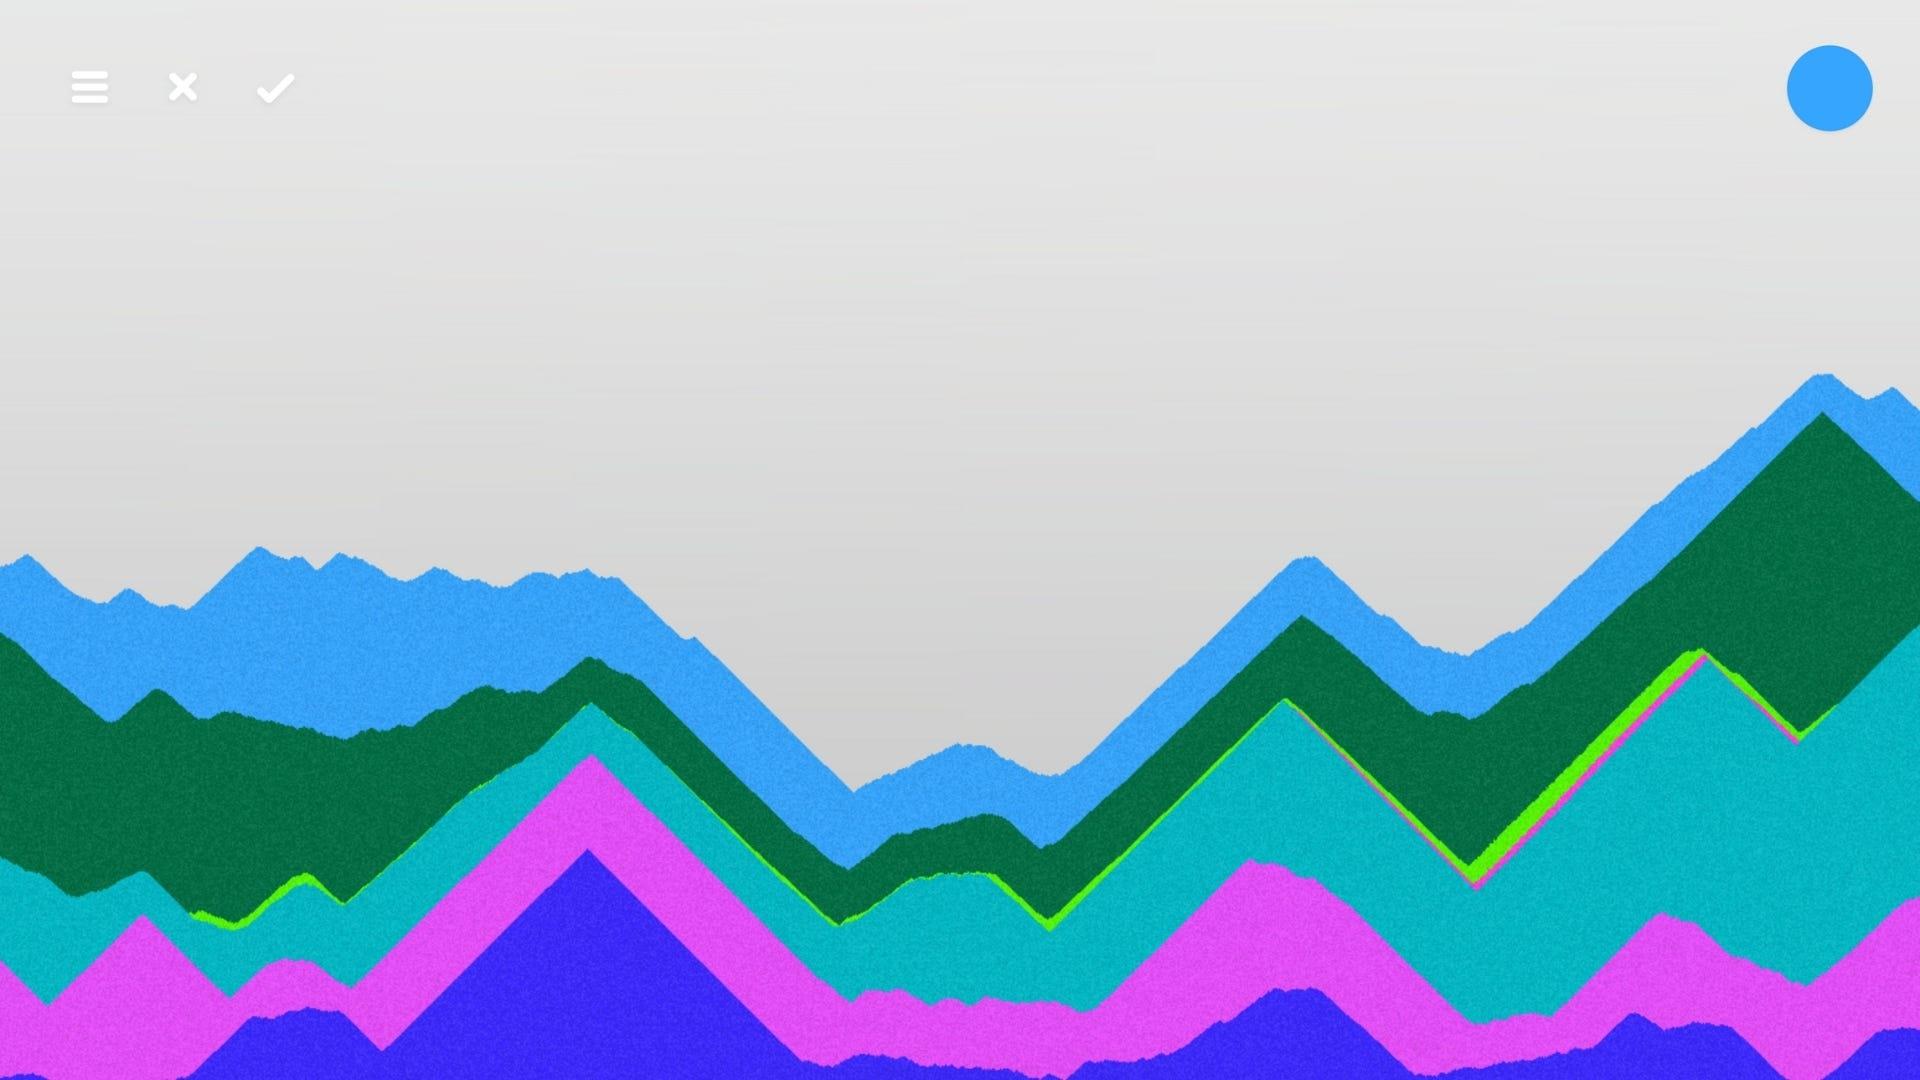 Multi-colored digital sand hills